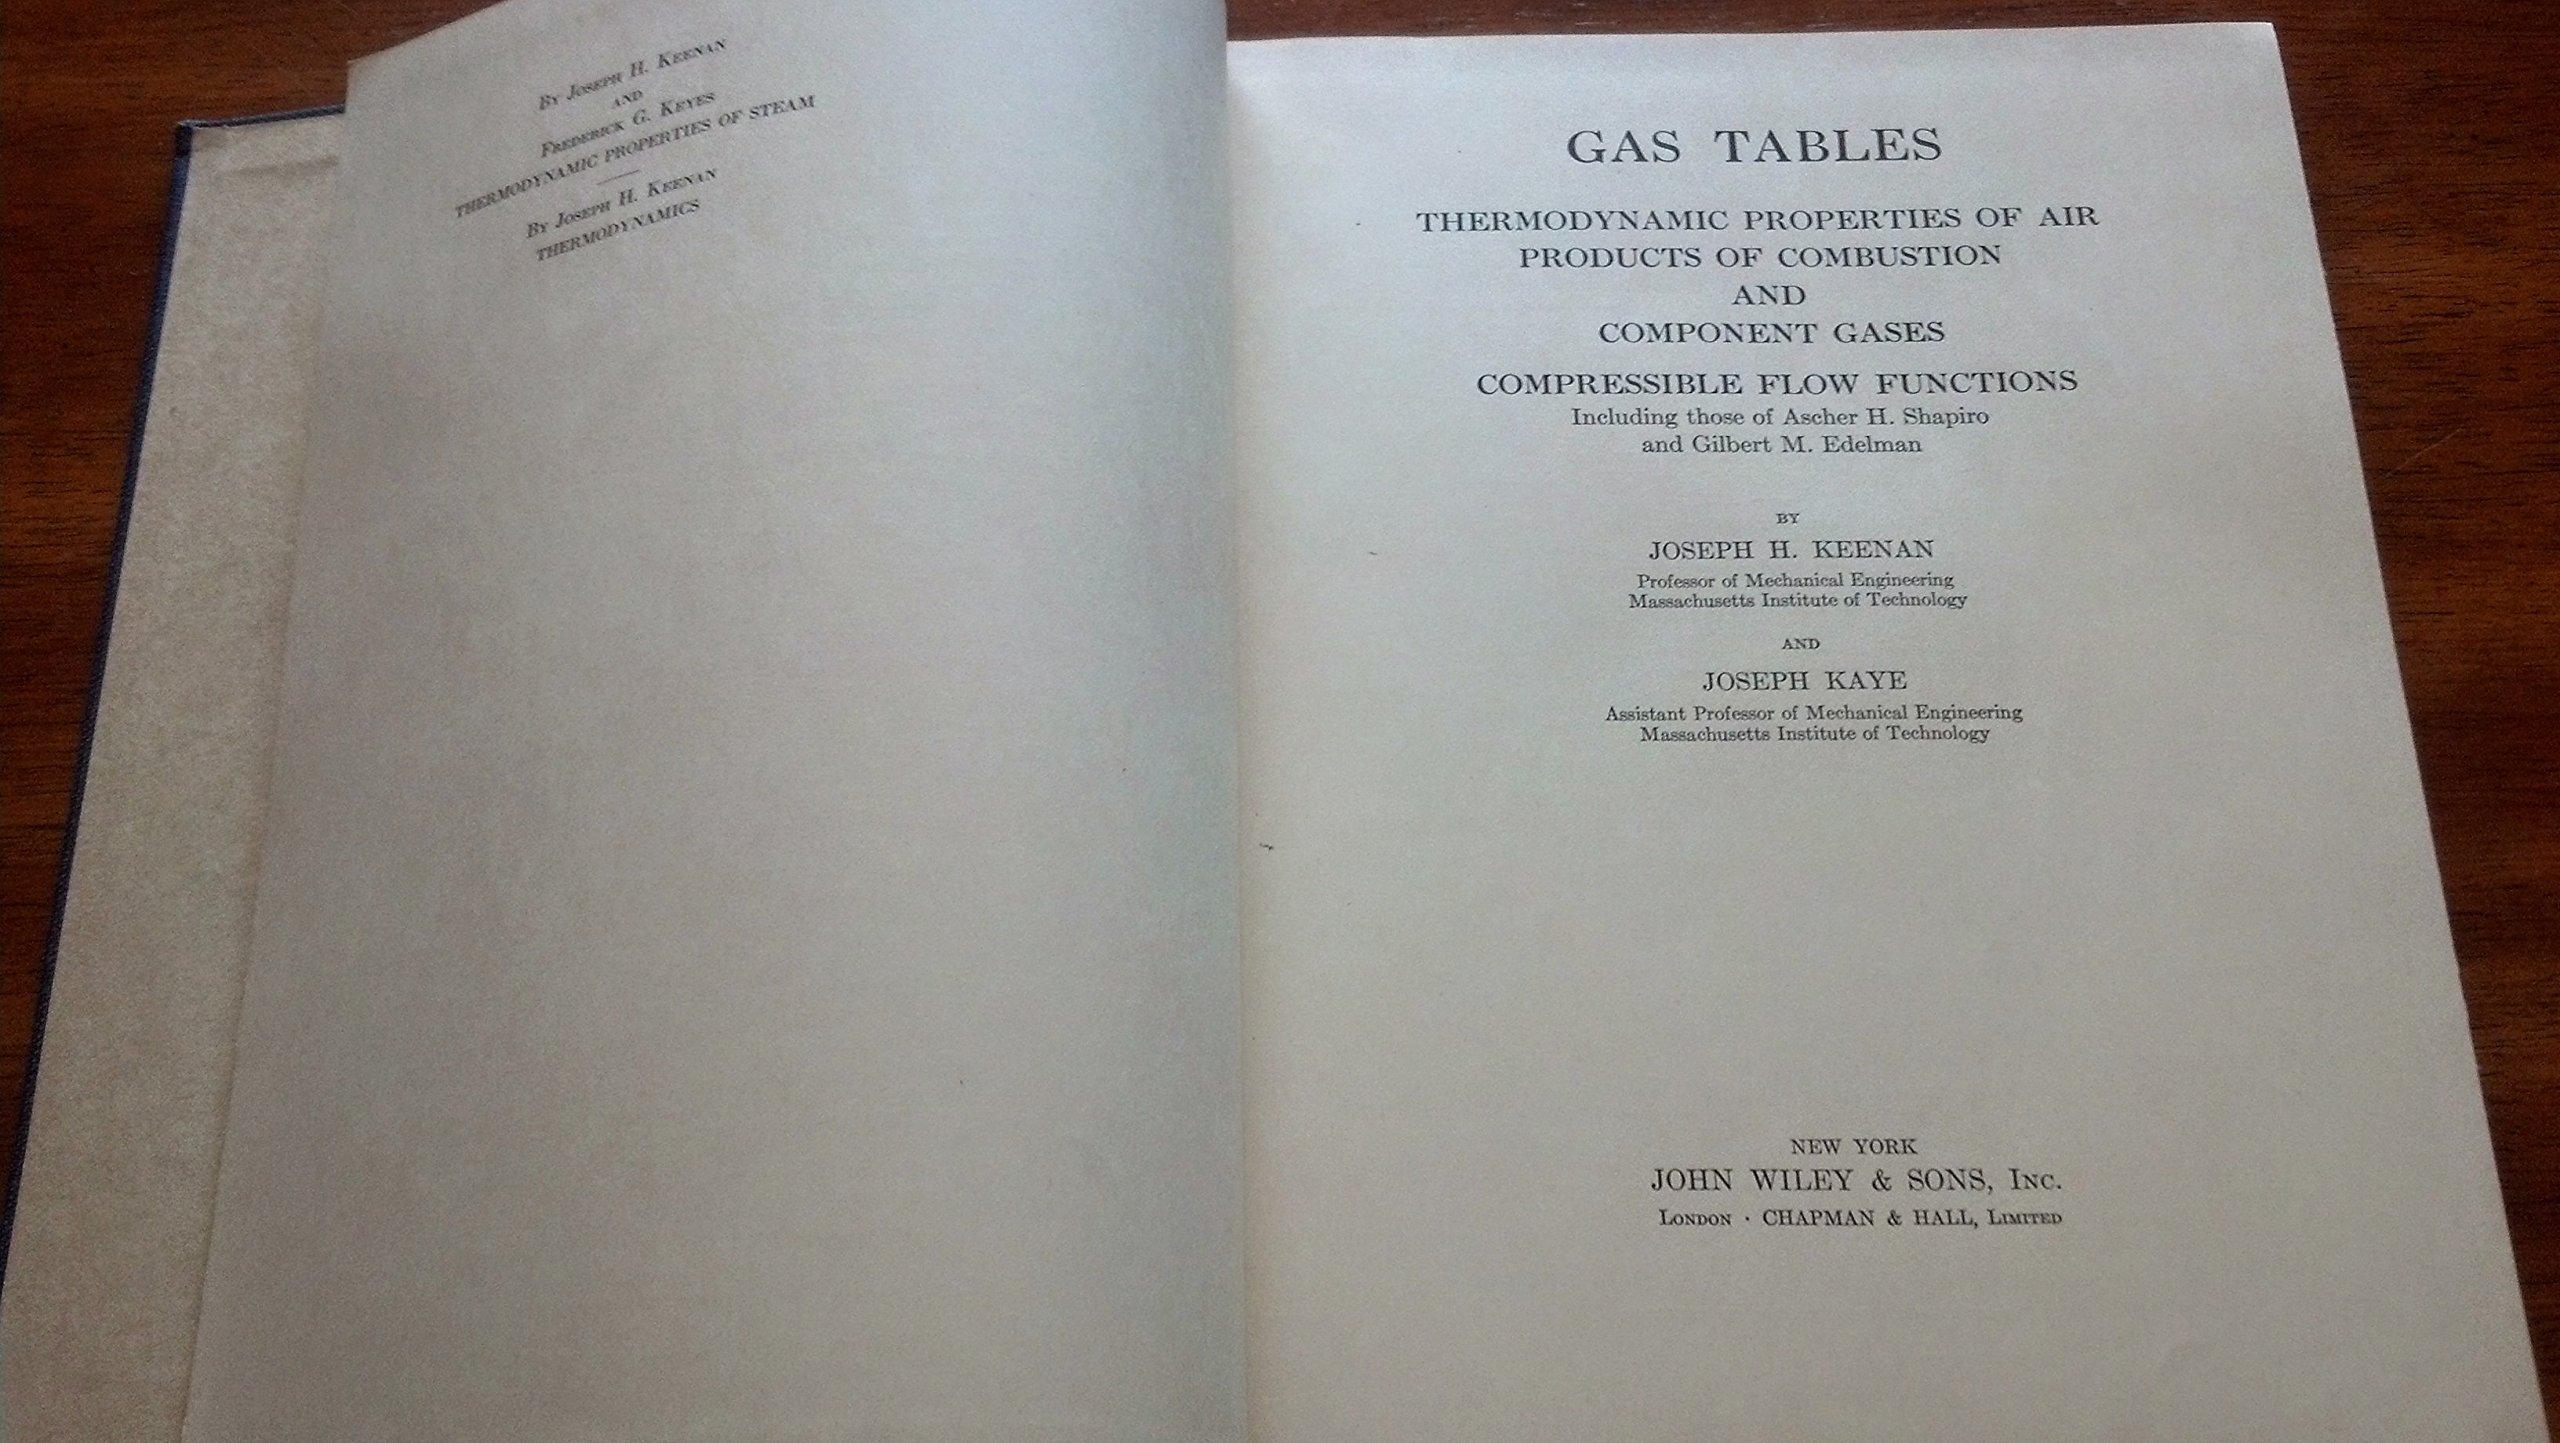 Gas Tables: Joseph H. Keenan, J. Kaye: 9780471464310: Amazon.com: Books